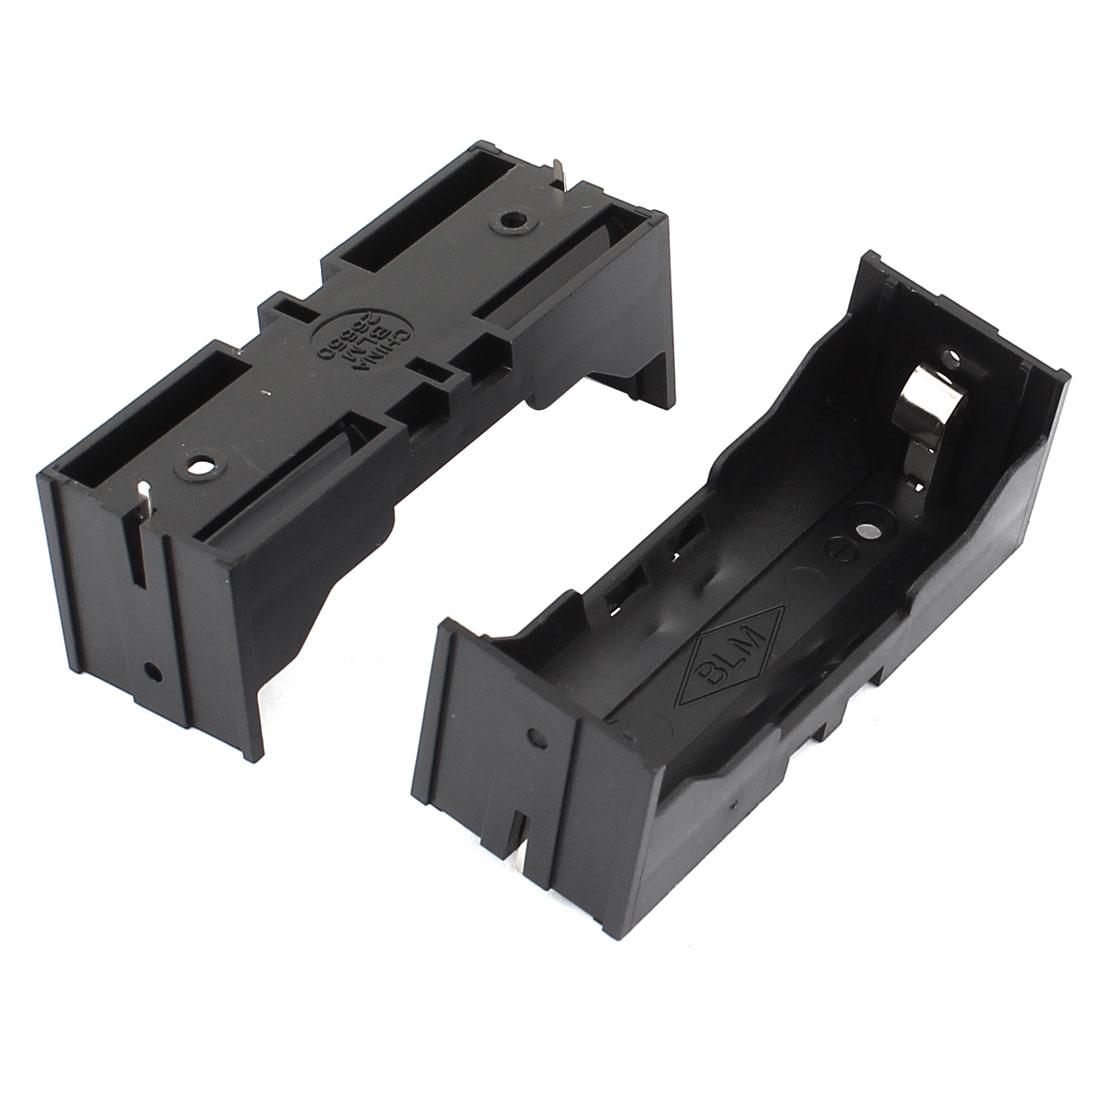 2Pcs Plastic Single 26650 Battery Holder Case Storage Box Black